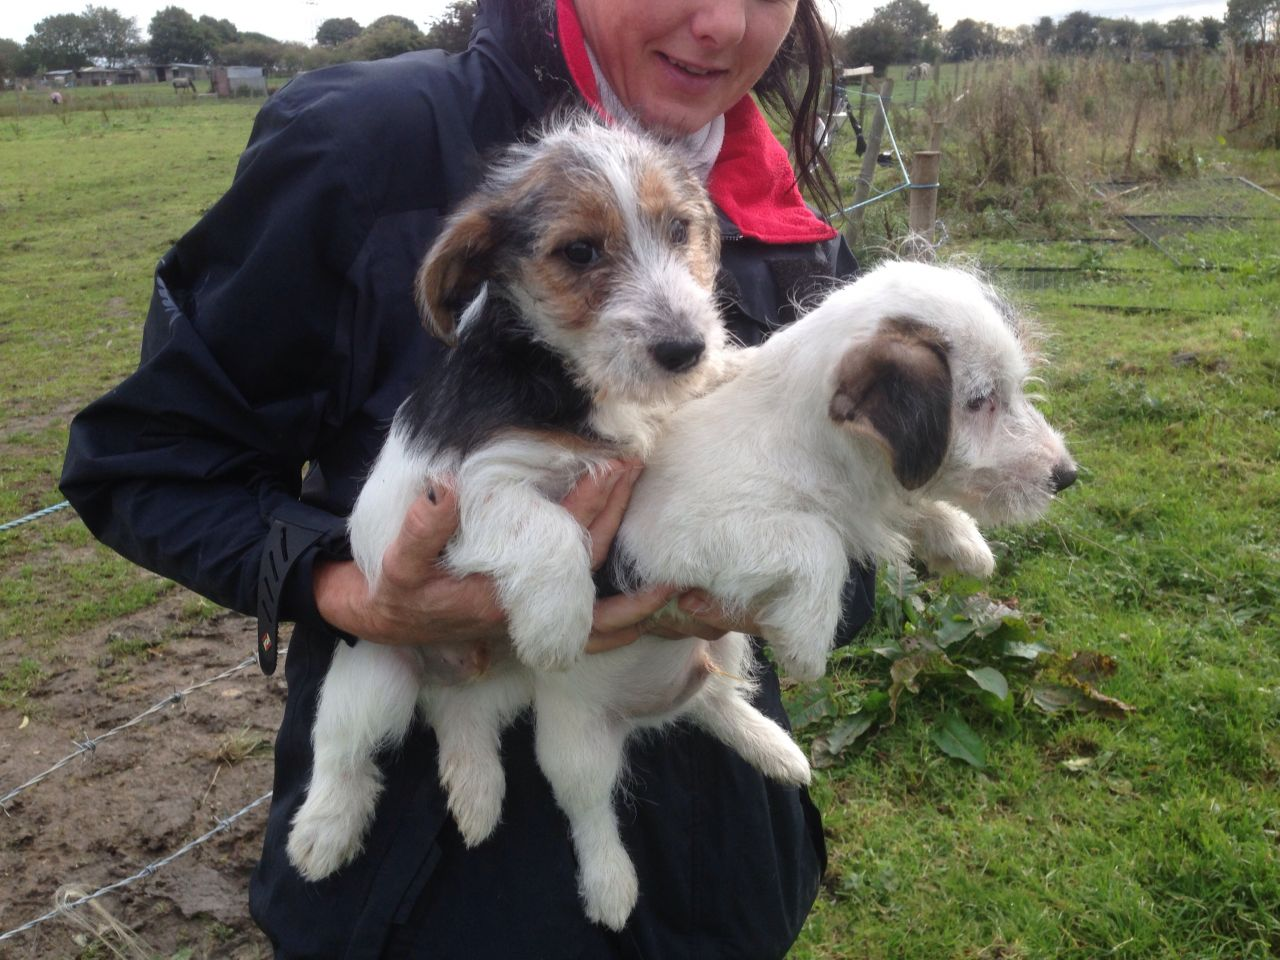 Sporting Lucas Terrier Puppies: Sporting Sporting Lucas Terrier Puppies Leeds Breed